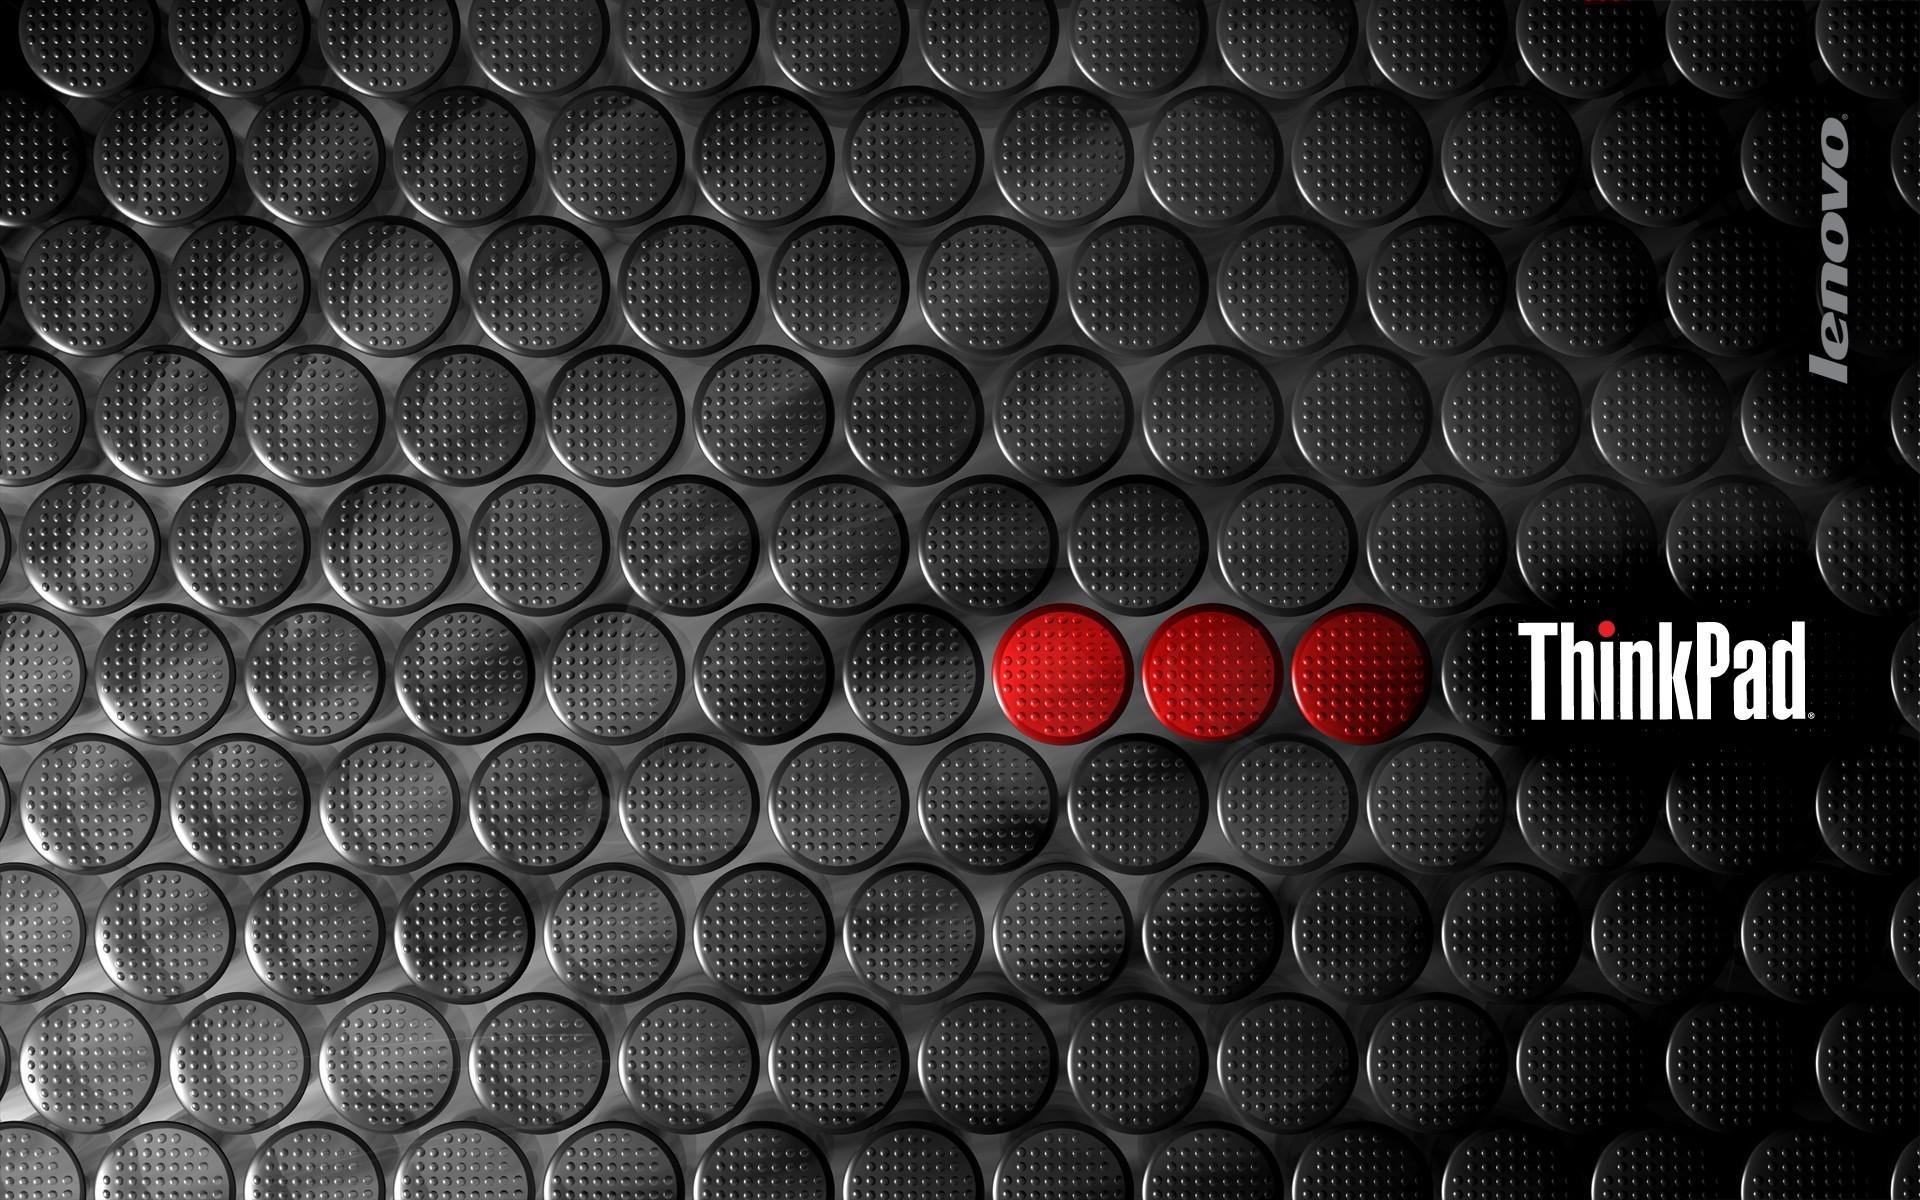 Lenovo Wallpaper 1920x1080 67 Images